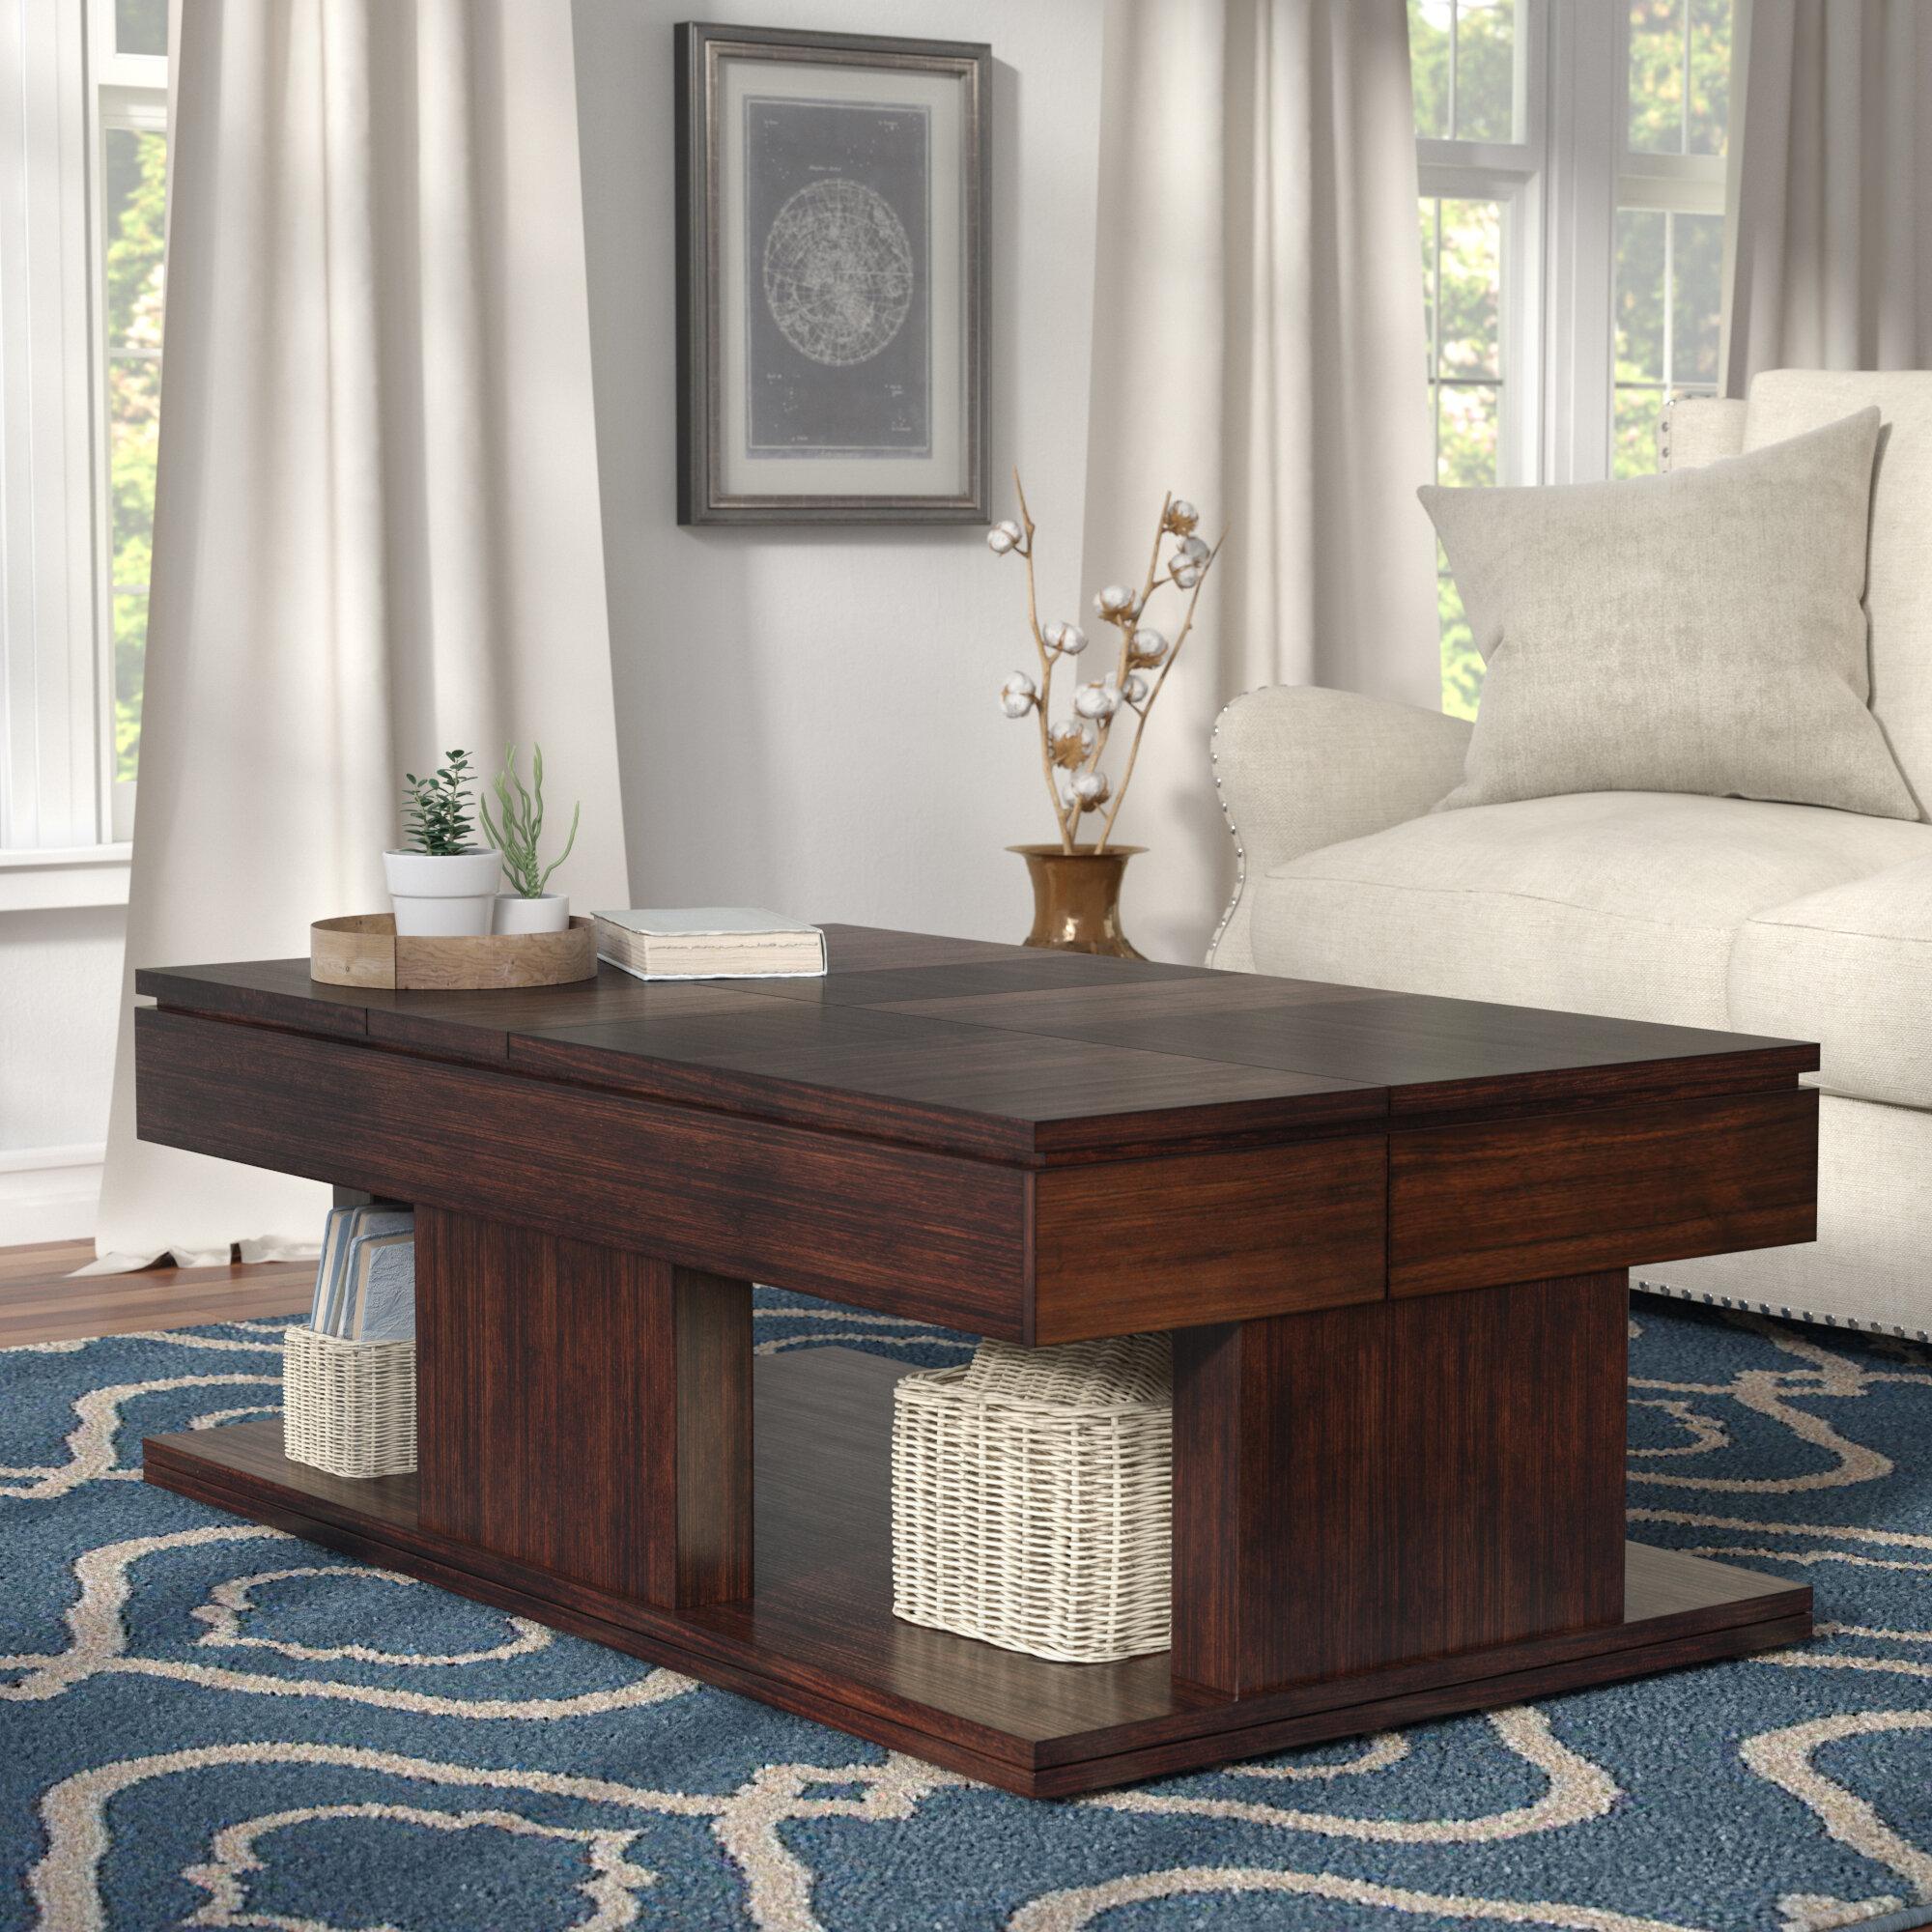 Darby Home Co Janene Lift Top Coffee Table & Reviews | Wayfair